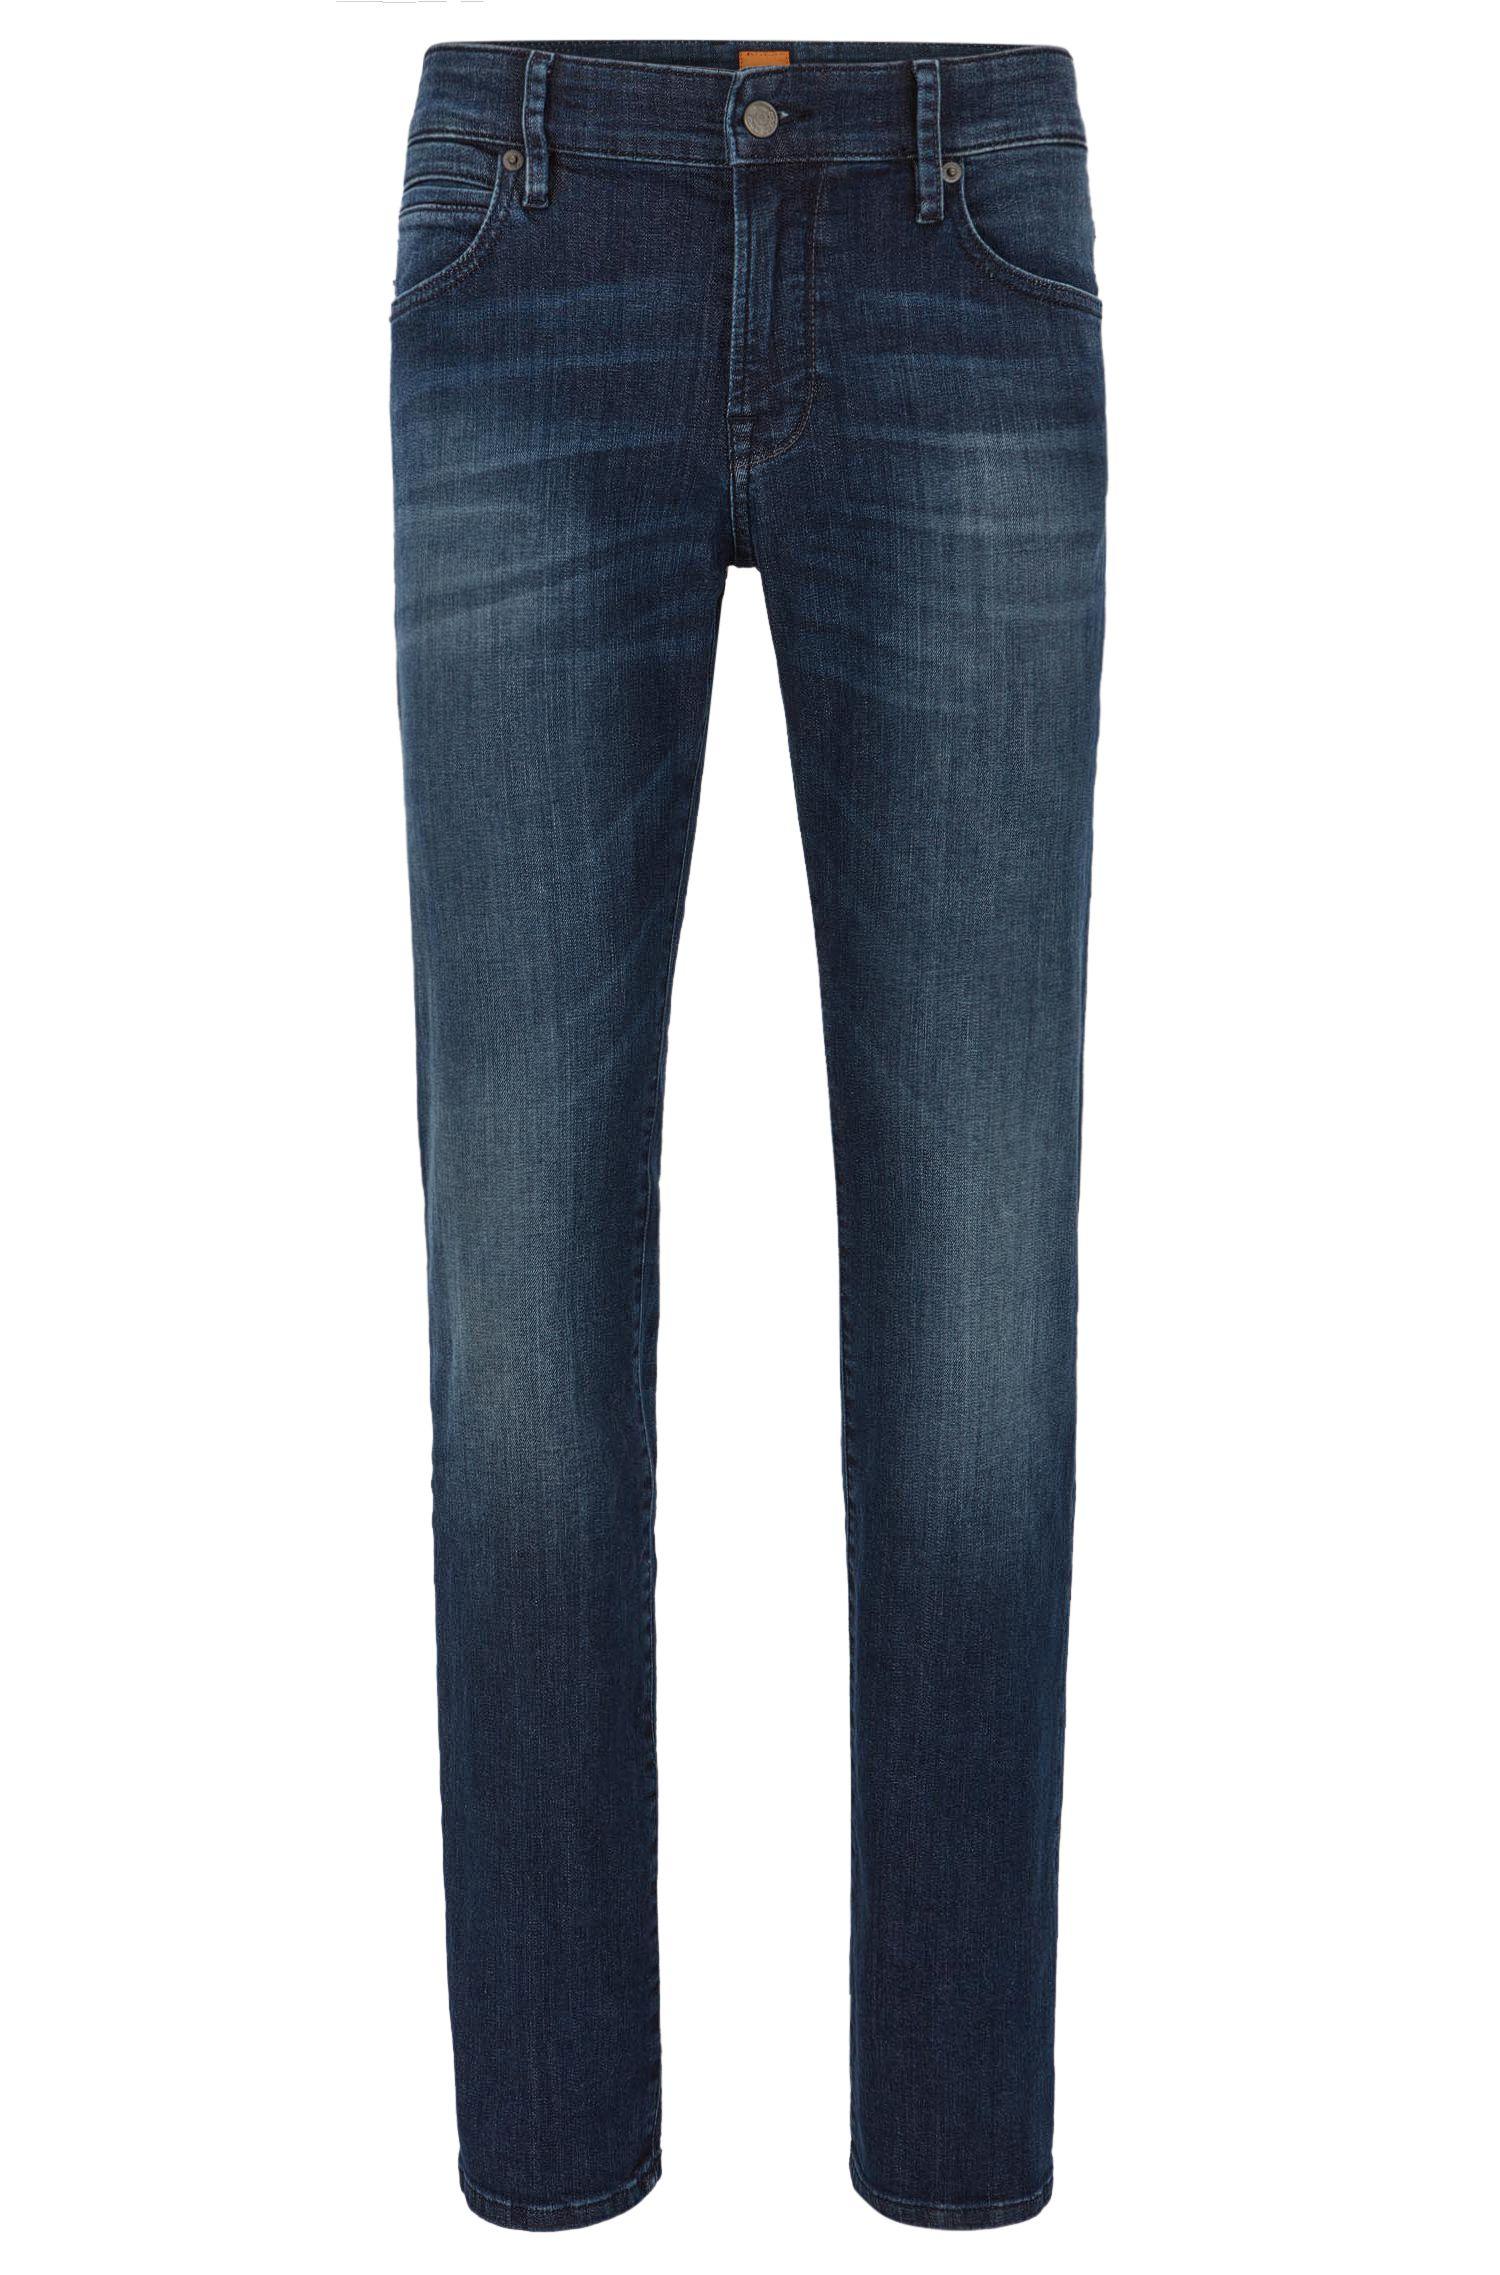 'Orange24 Barcelona' P' | Regular Fit, 11 oz Slub Stretch Cotton Blend Jeans